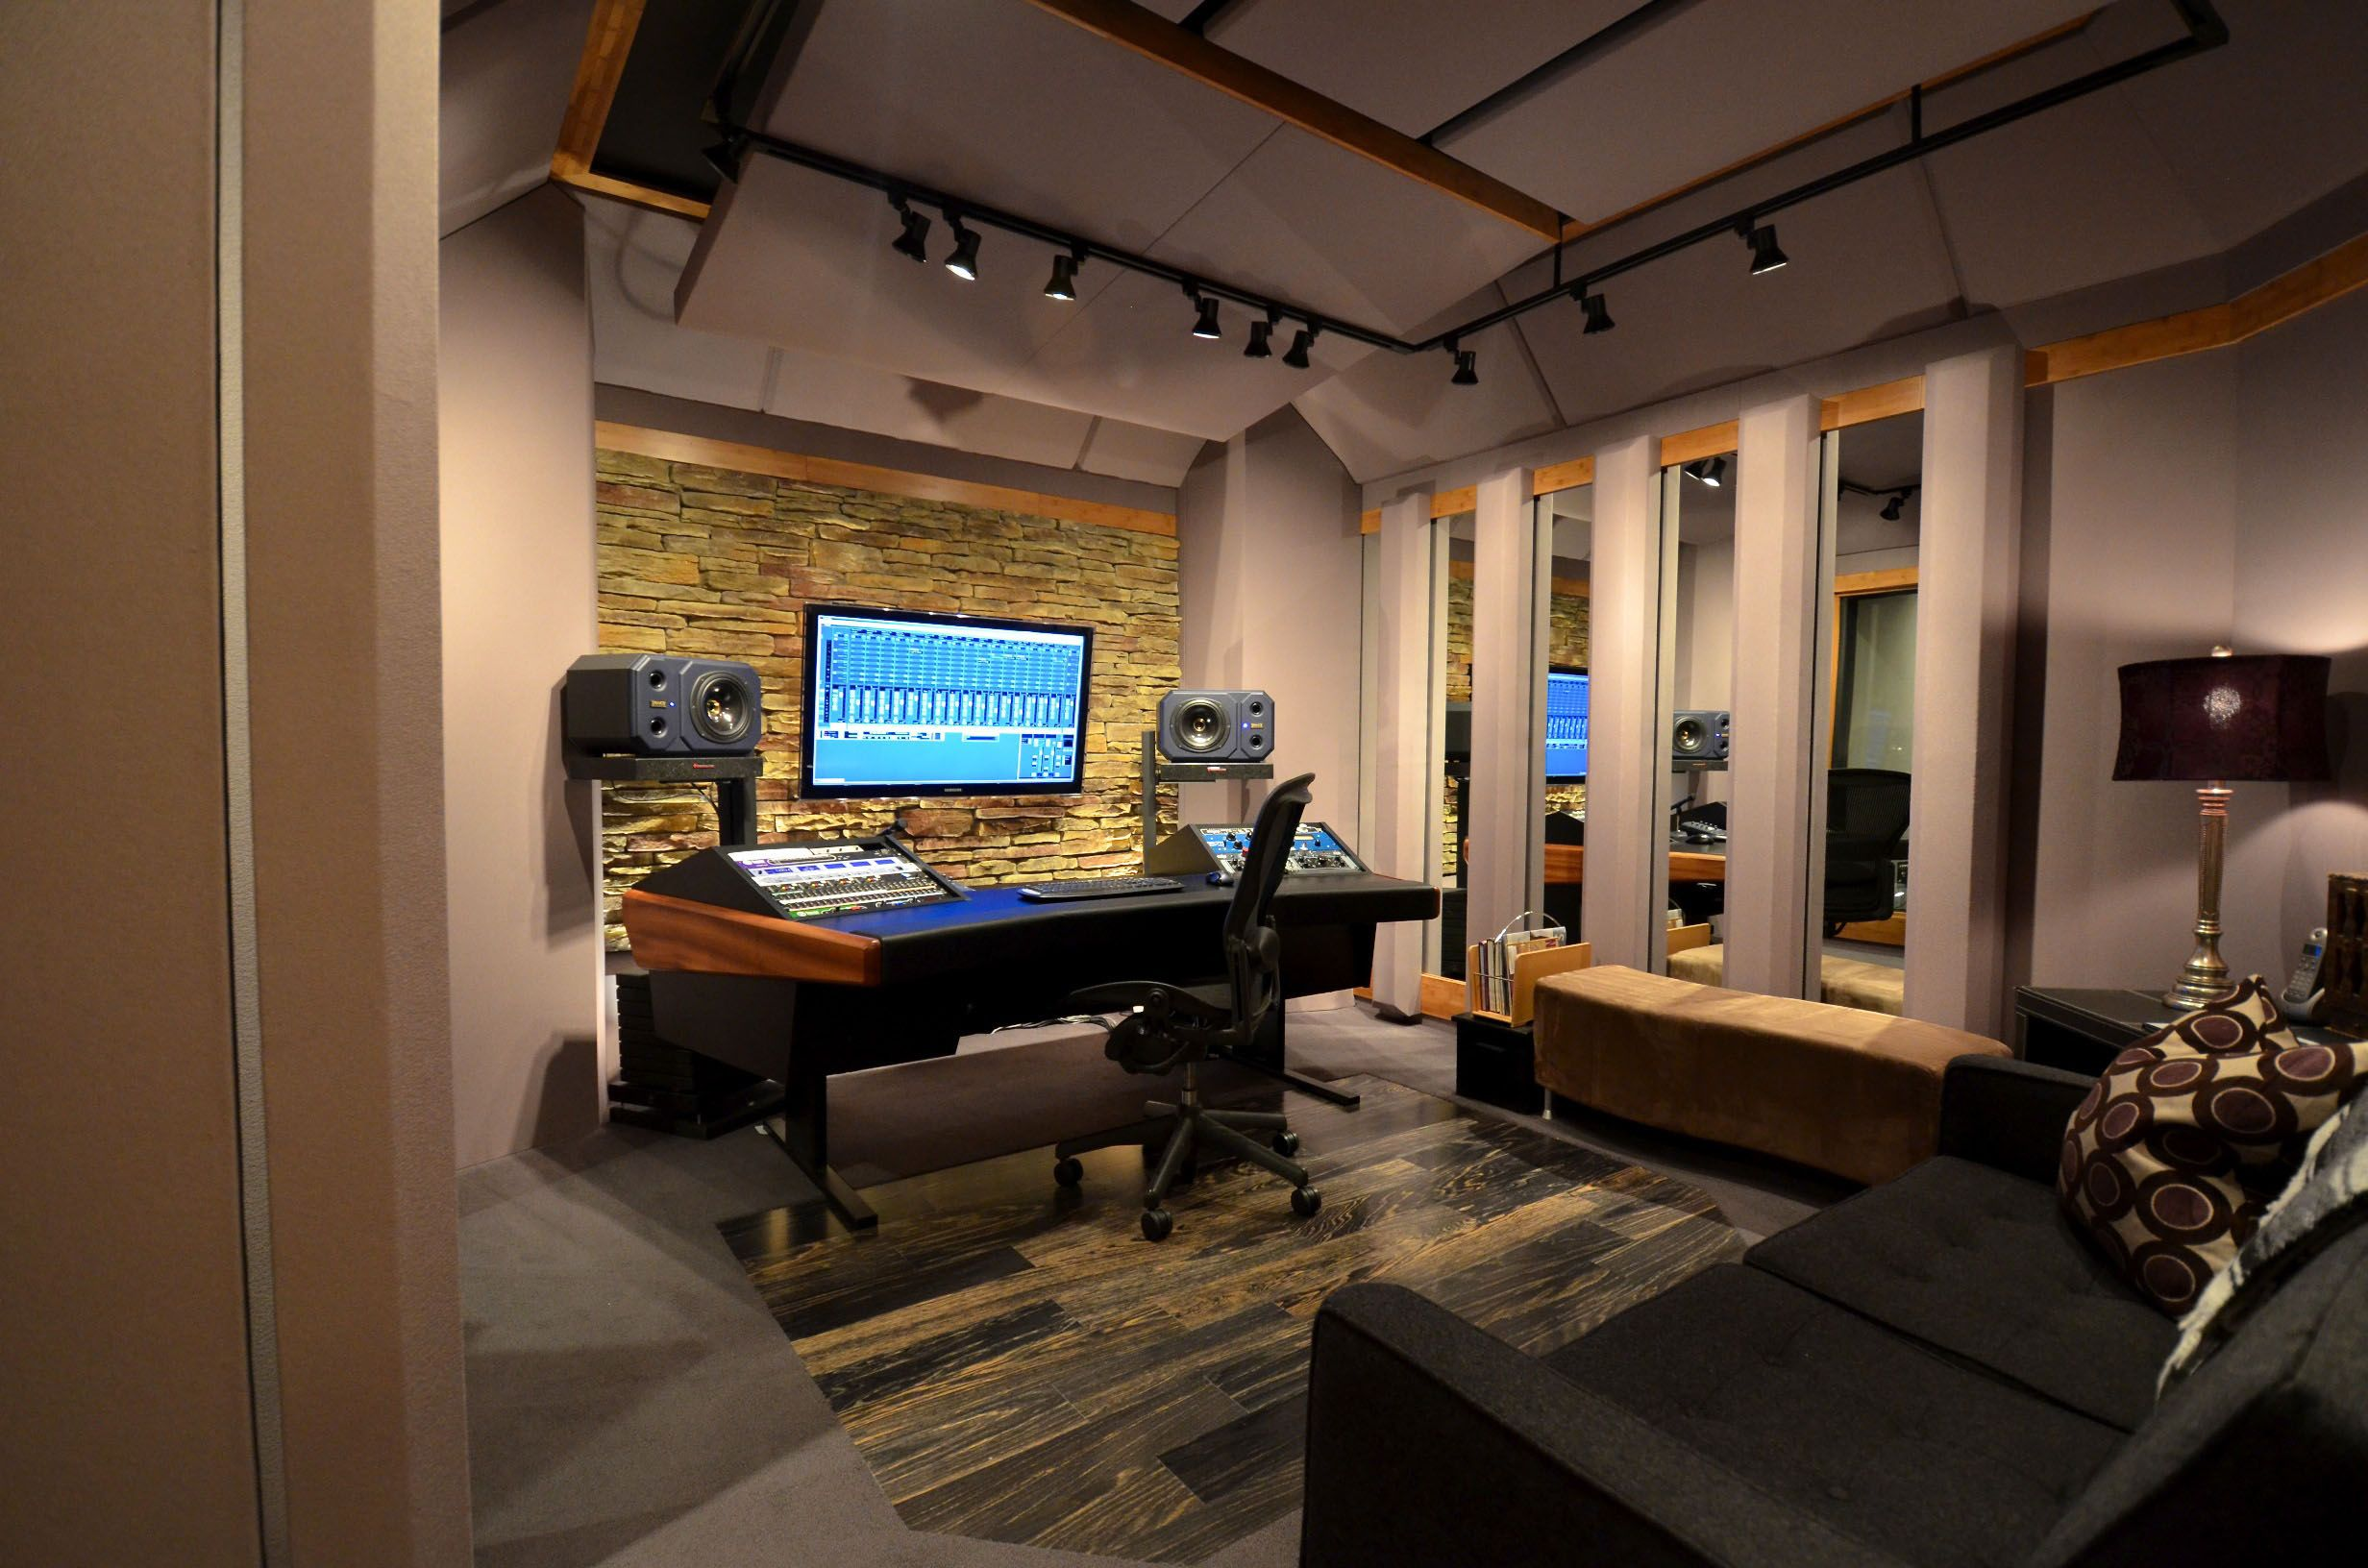 Elegant Picture Of Home Studio Design Ideas Interior Design Ideas Home Decorating Inspiration Moercar Home Music Rooms Music Room Design Home Studio Setup